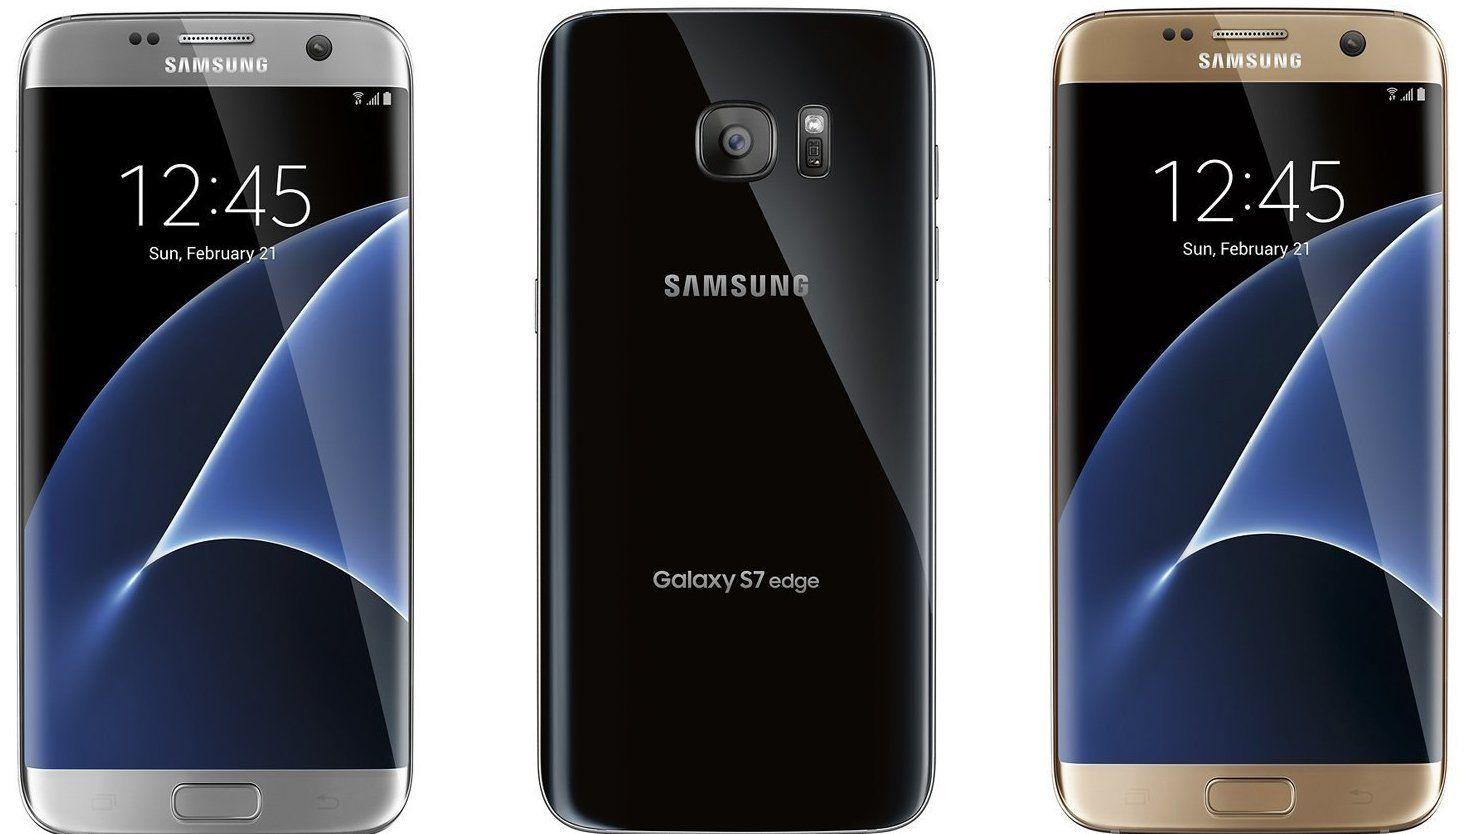 Alle ryktene om Galaxy S7